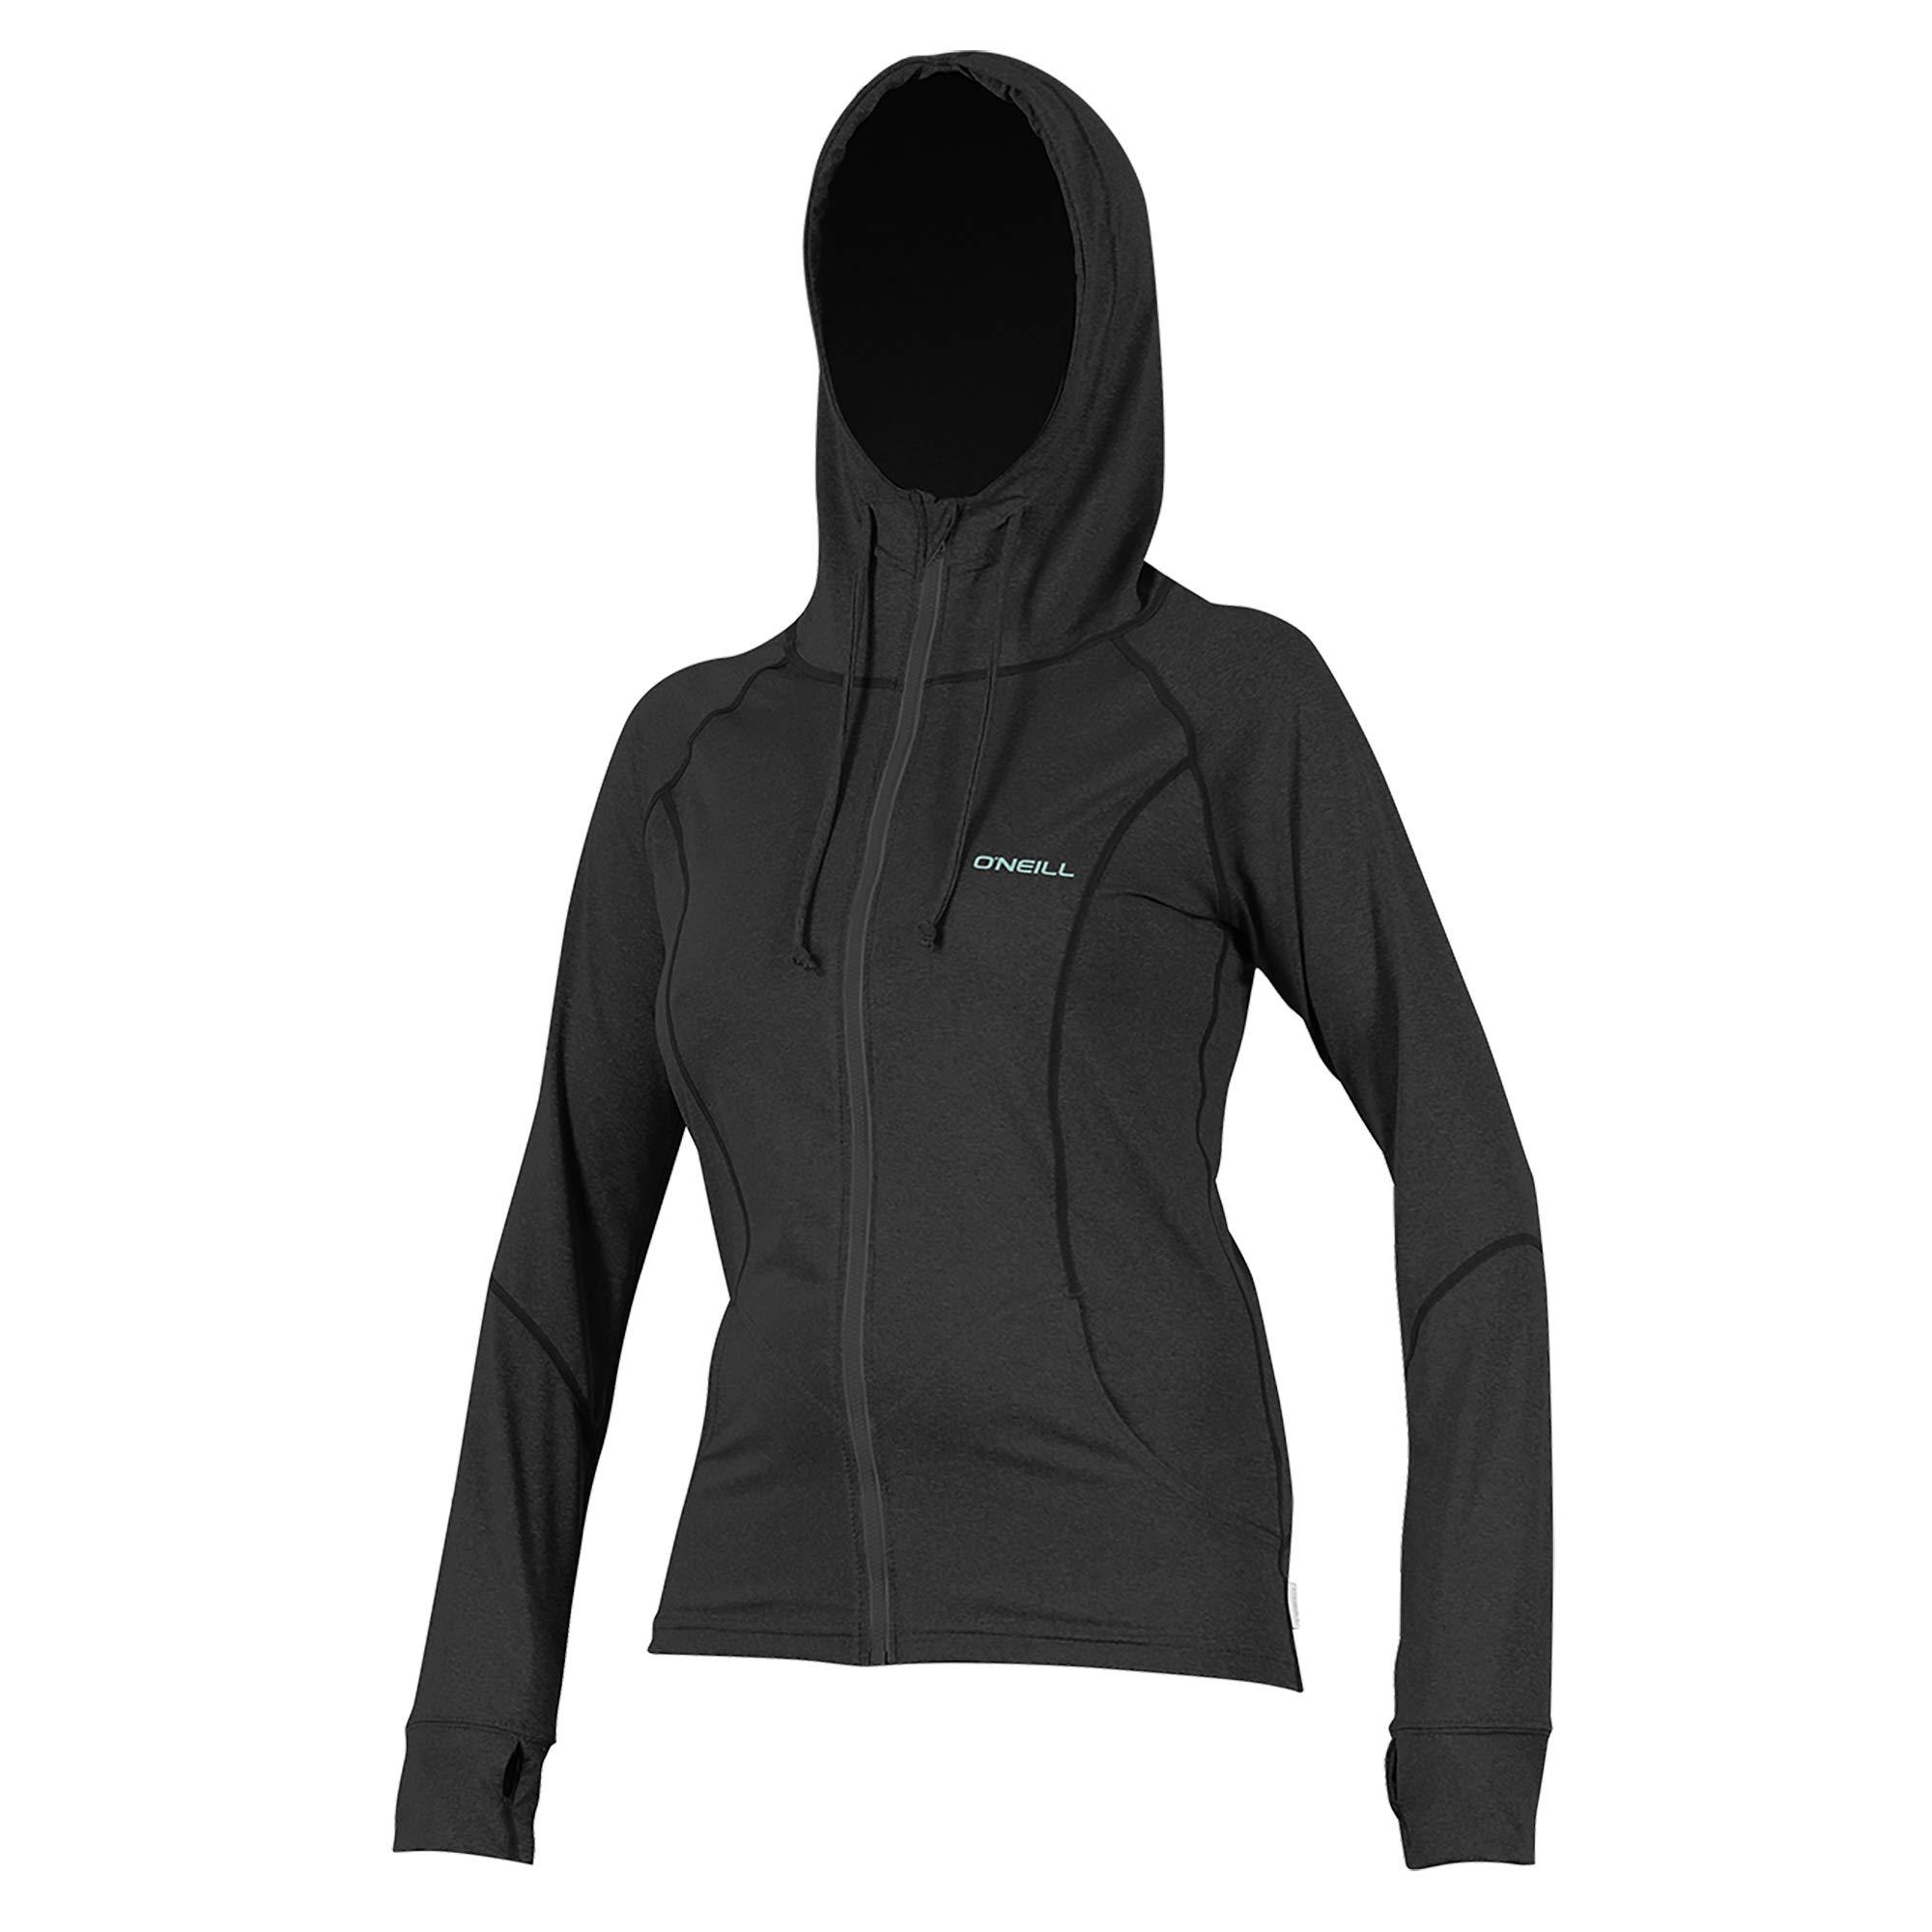 O'Neill Wetsuits Women's Hybrid UPF 50+ Long Sleeve Full Zip Sun Hoodie, Black, X-Small